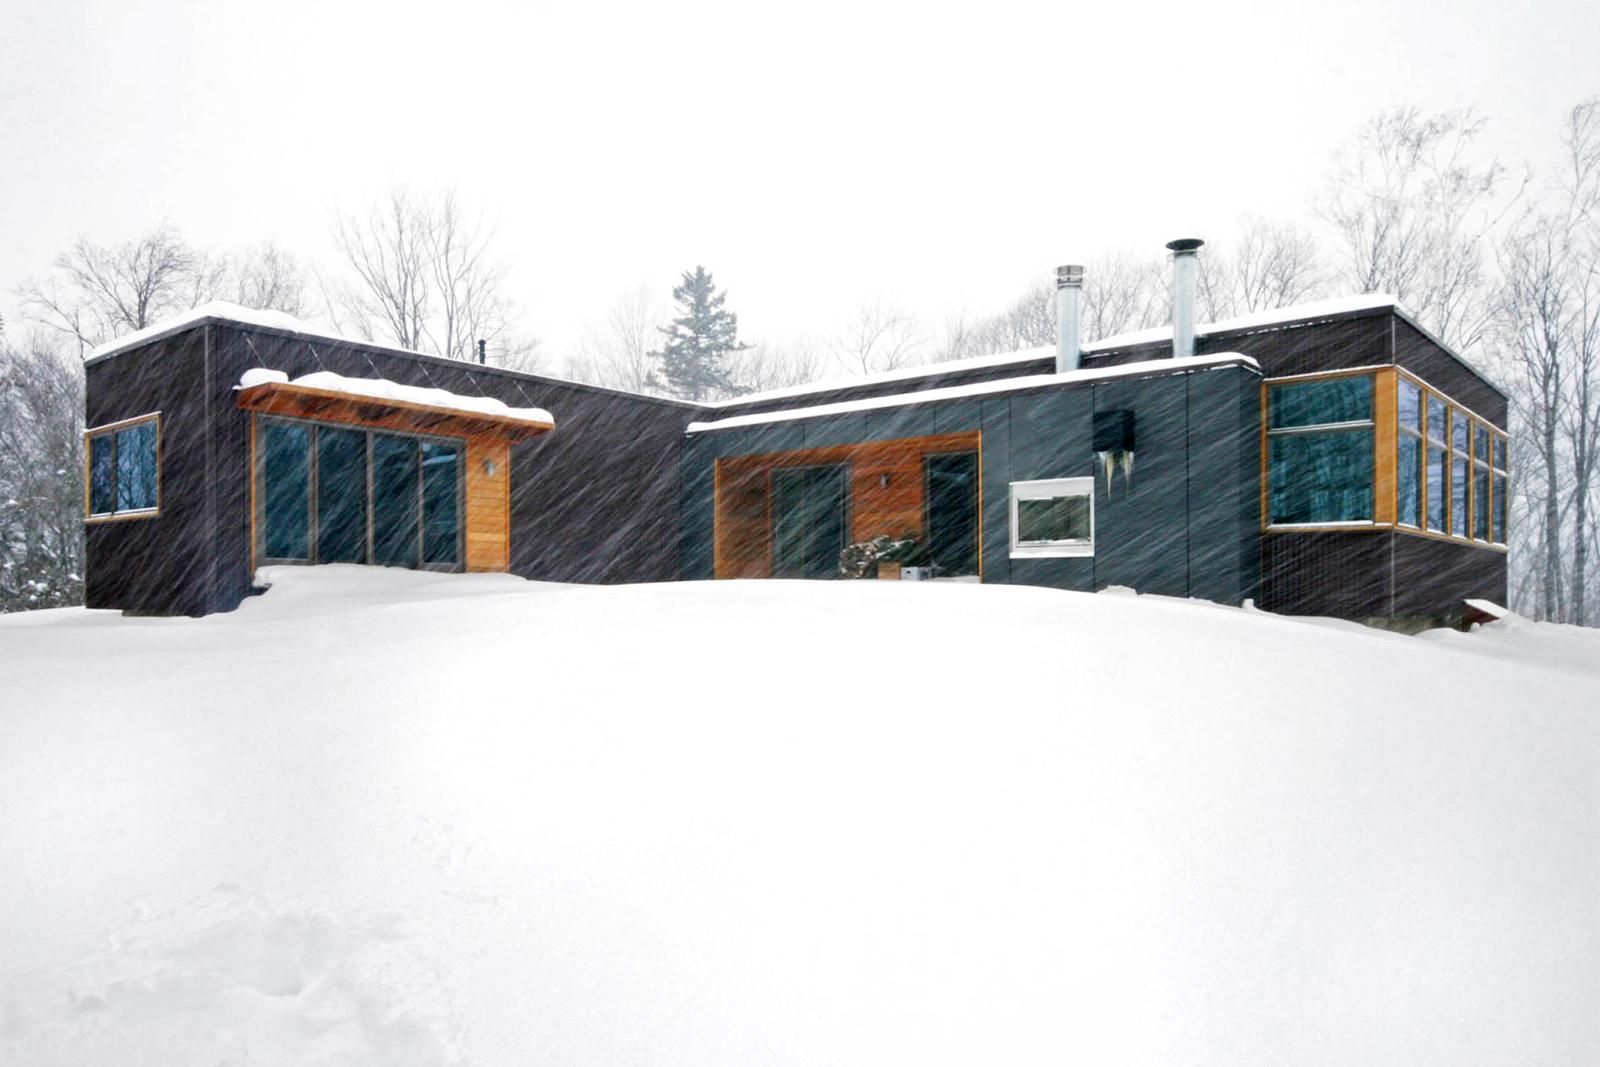 11-res4-resolution-4-architecture-modern-modular-home-prefab-house-vermont-cabin-exterior.jpg